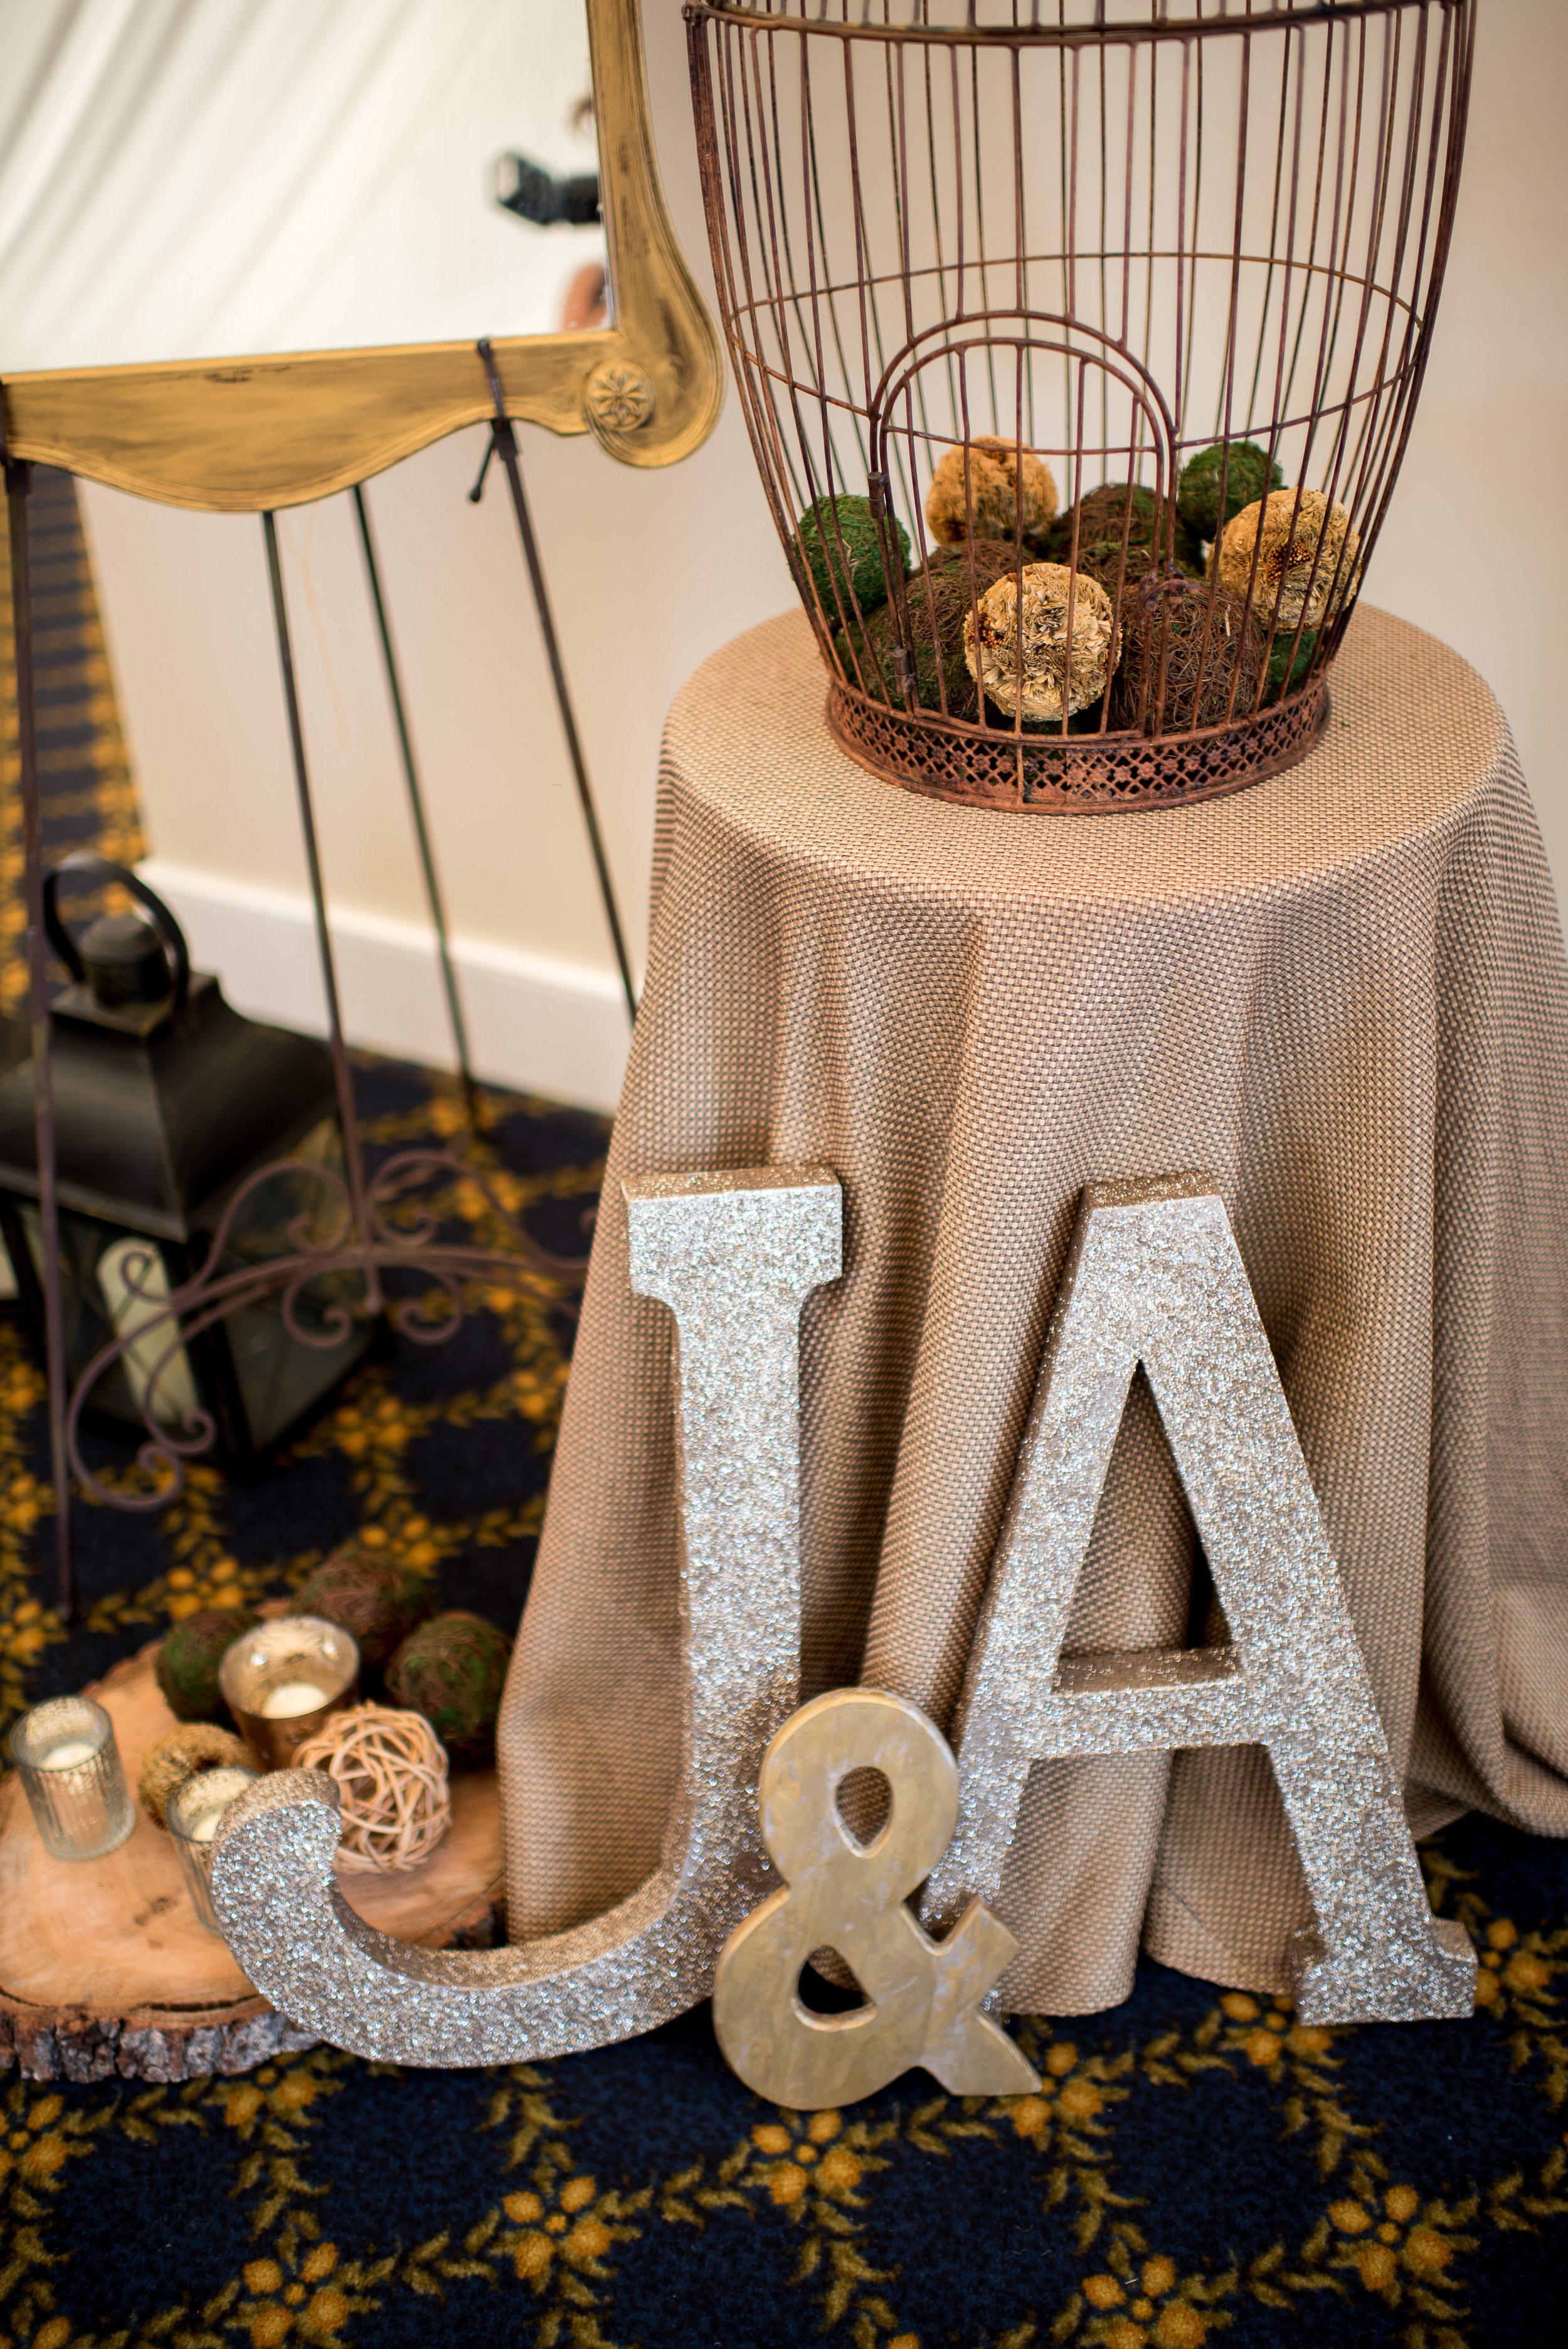 brandywine-wedding-tessie-reveliotis-photography-beautiful-and-blessed-events-030